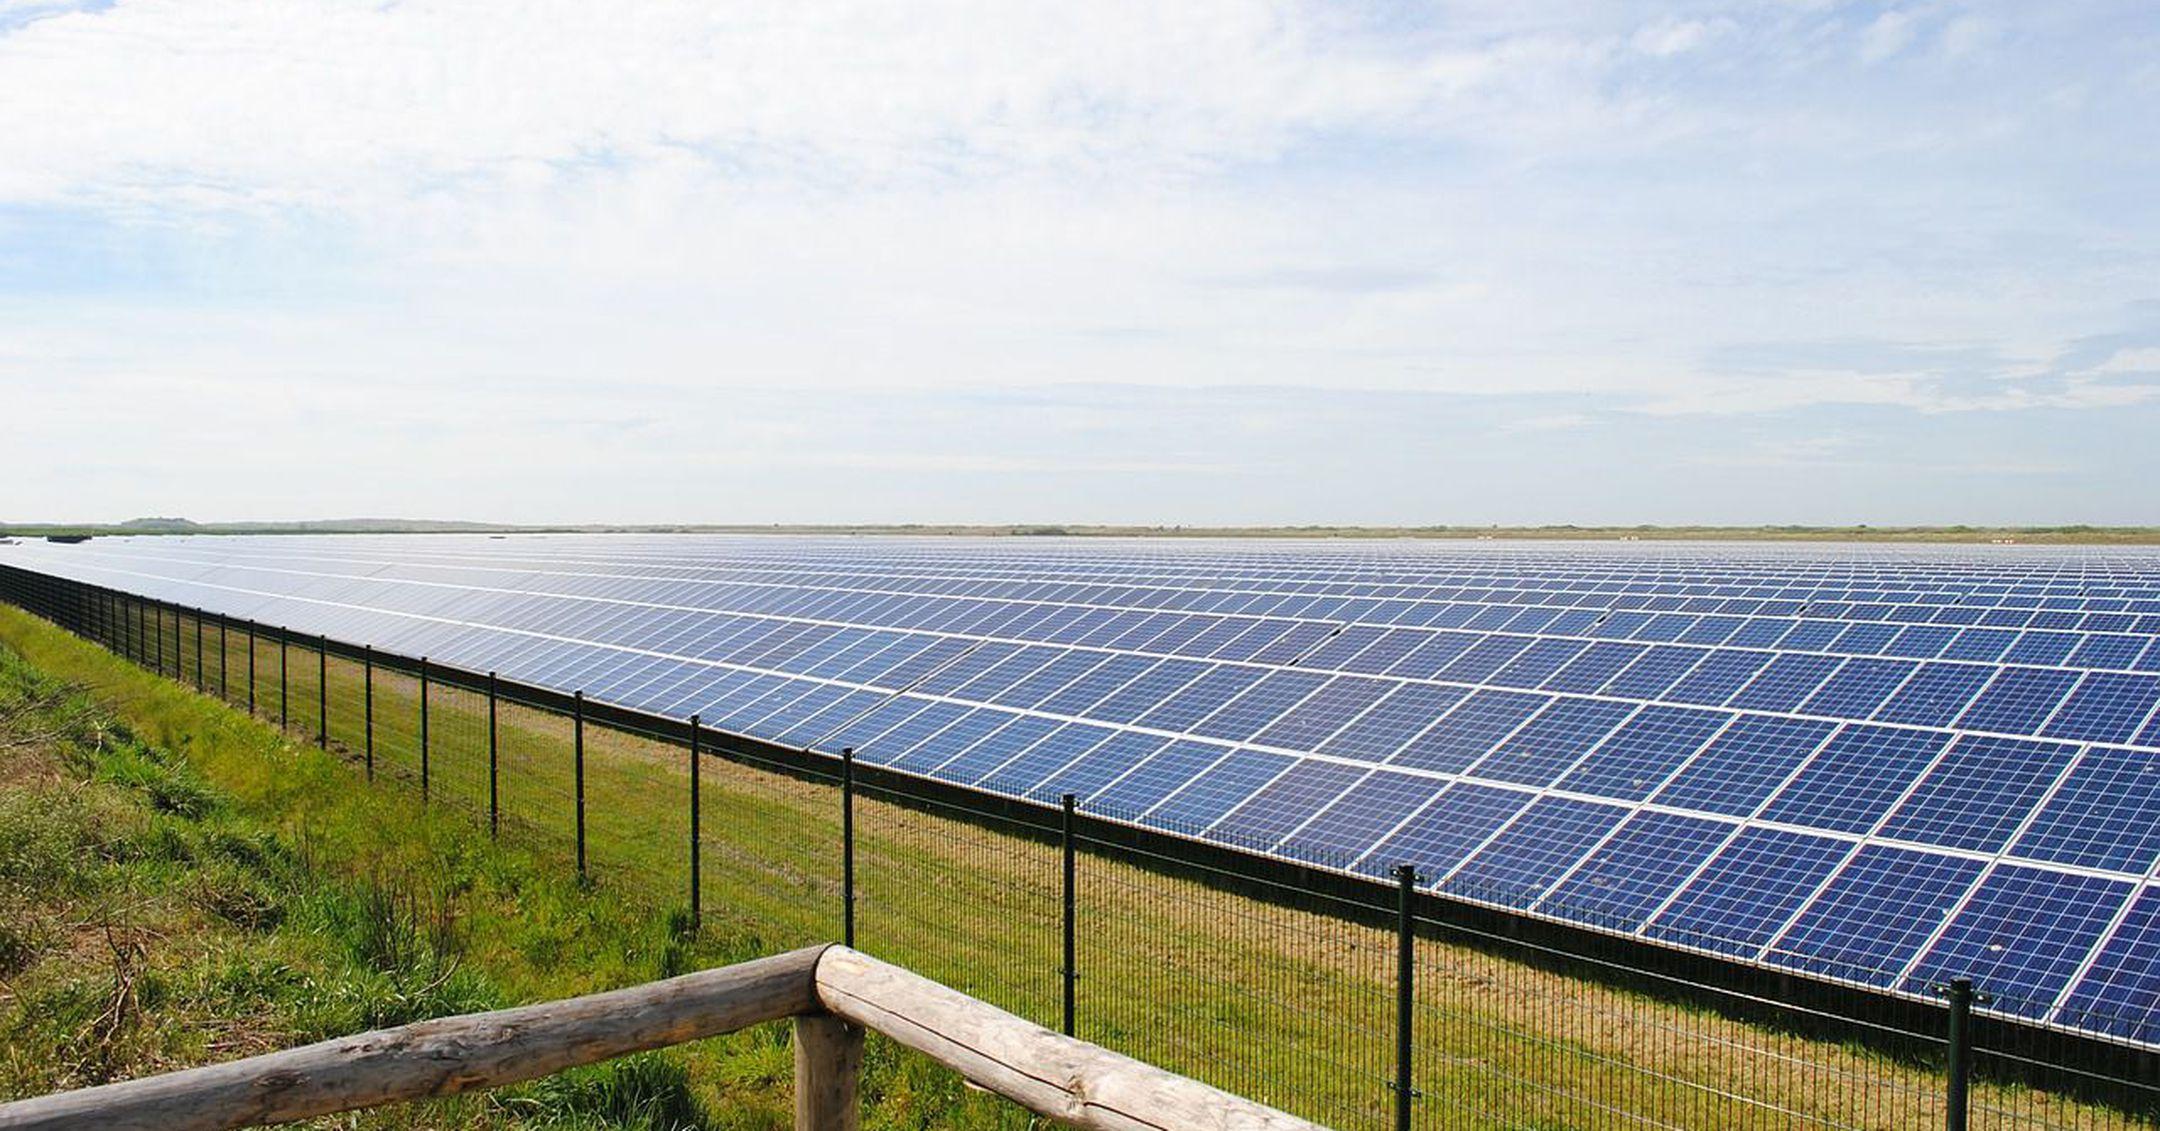 solar-panels-2423614_1280-1513635223750-1535663632524-1535663635017.jpg